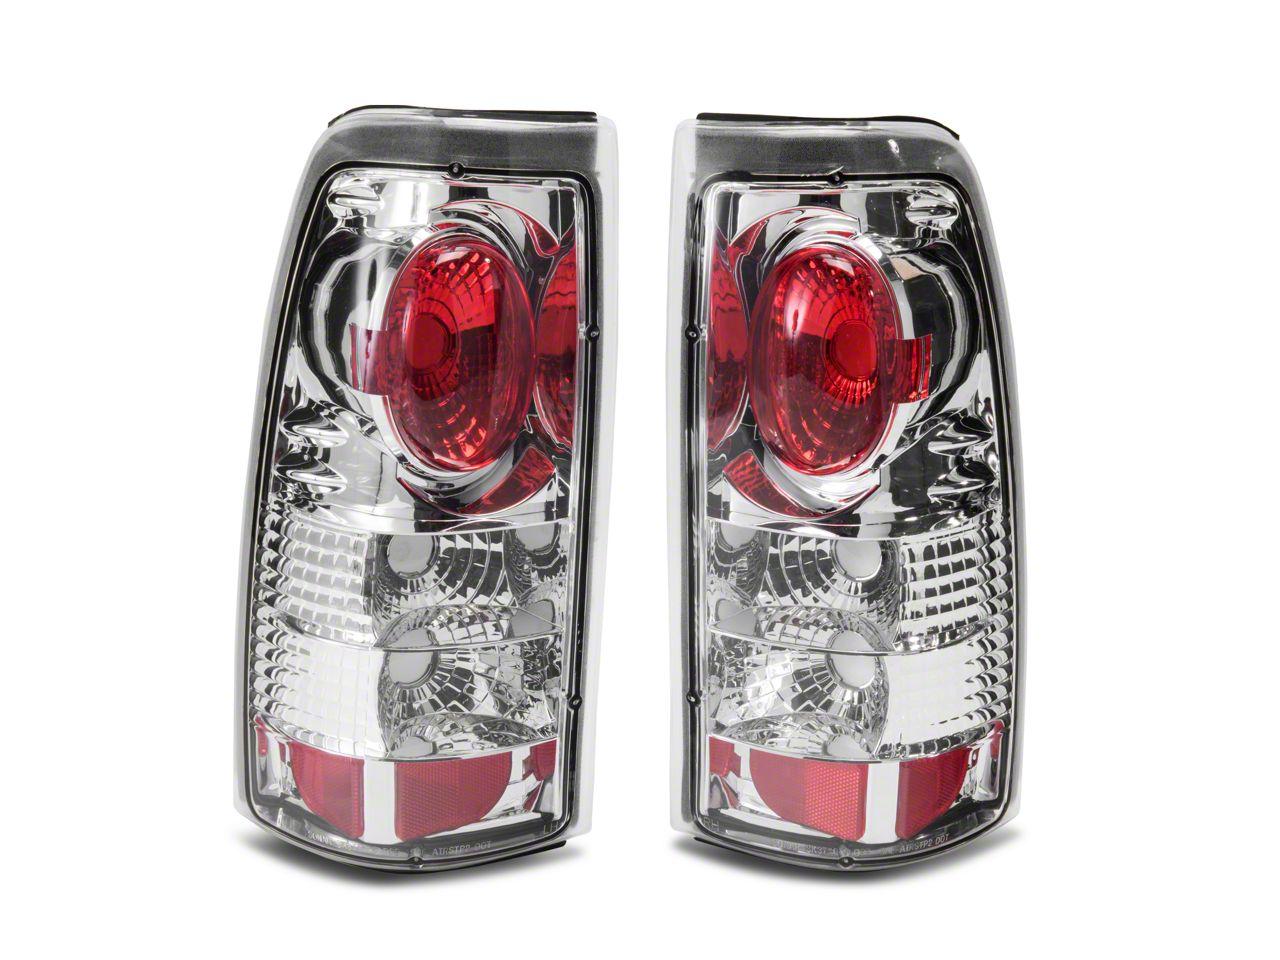 Axial Chrome Euro Style Tail Lights (99-02 Silverado 1500 Fleetside)